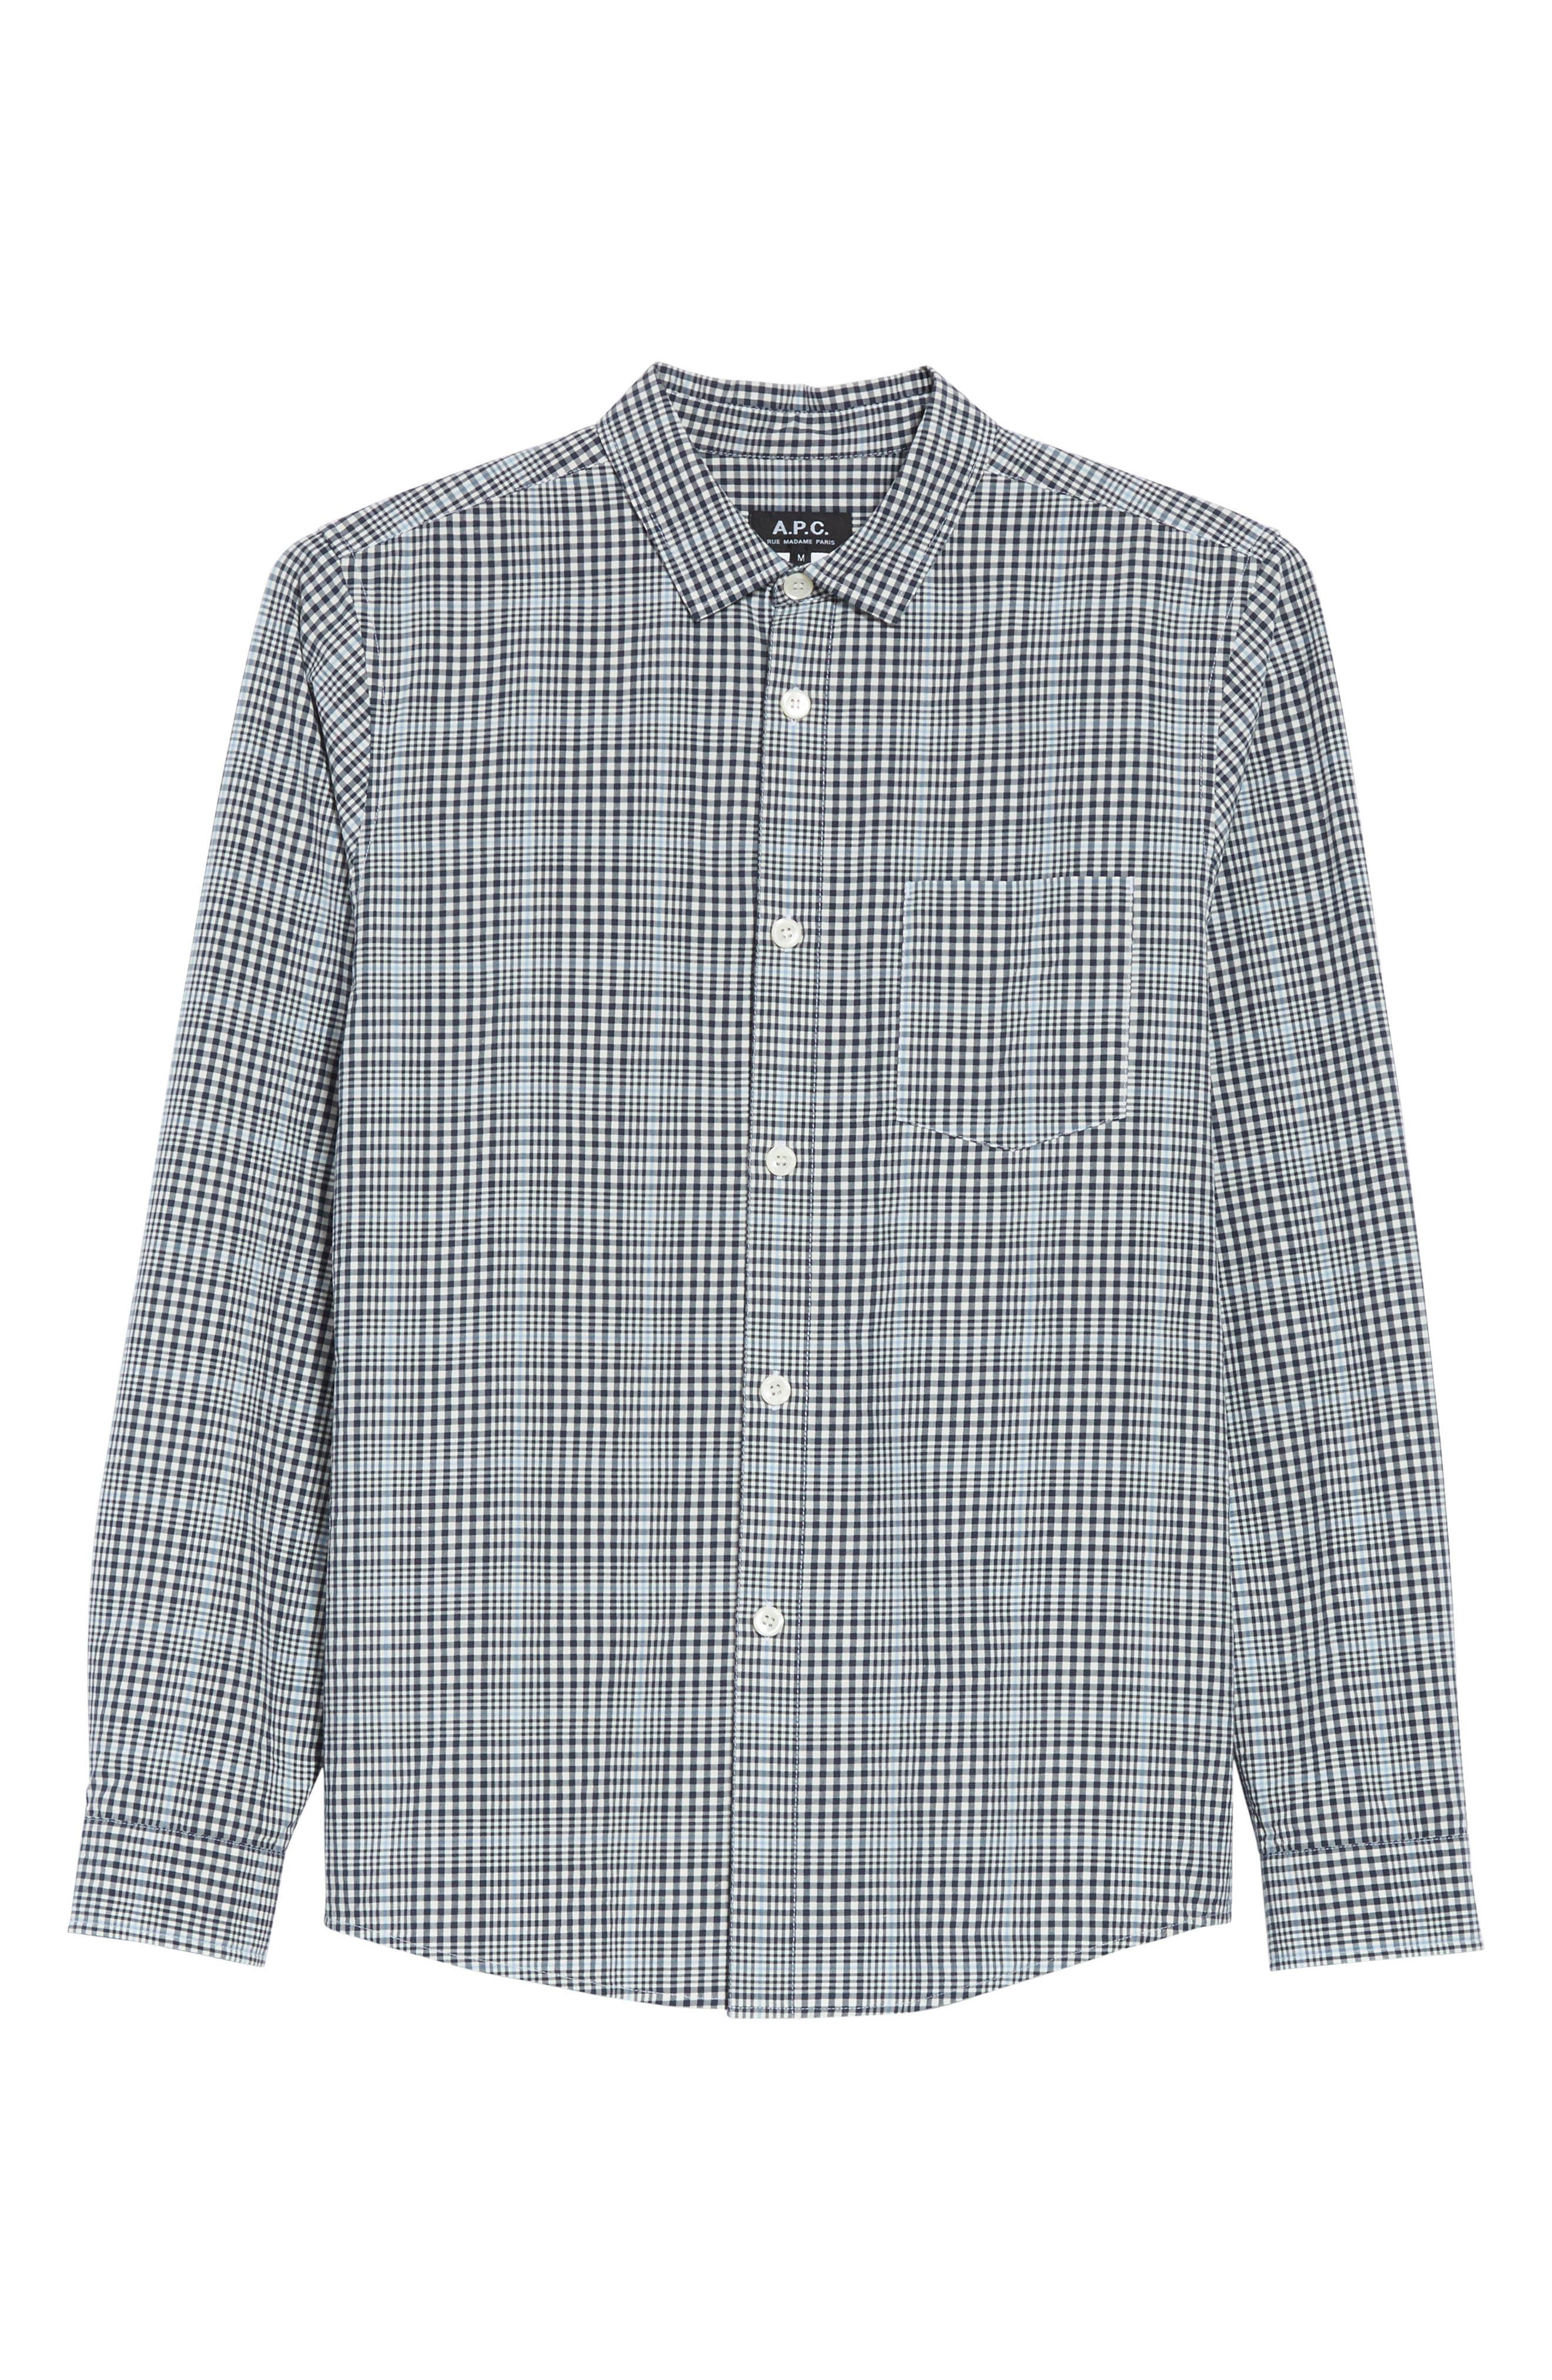 John Check Woven Shirt,                             Alternate thumbnail 6, color,                             410